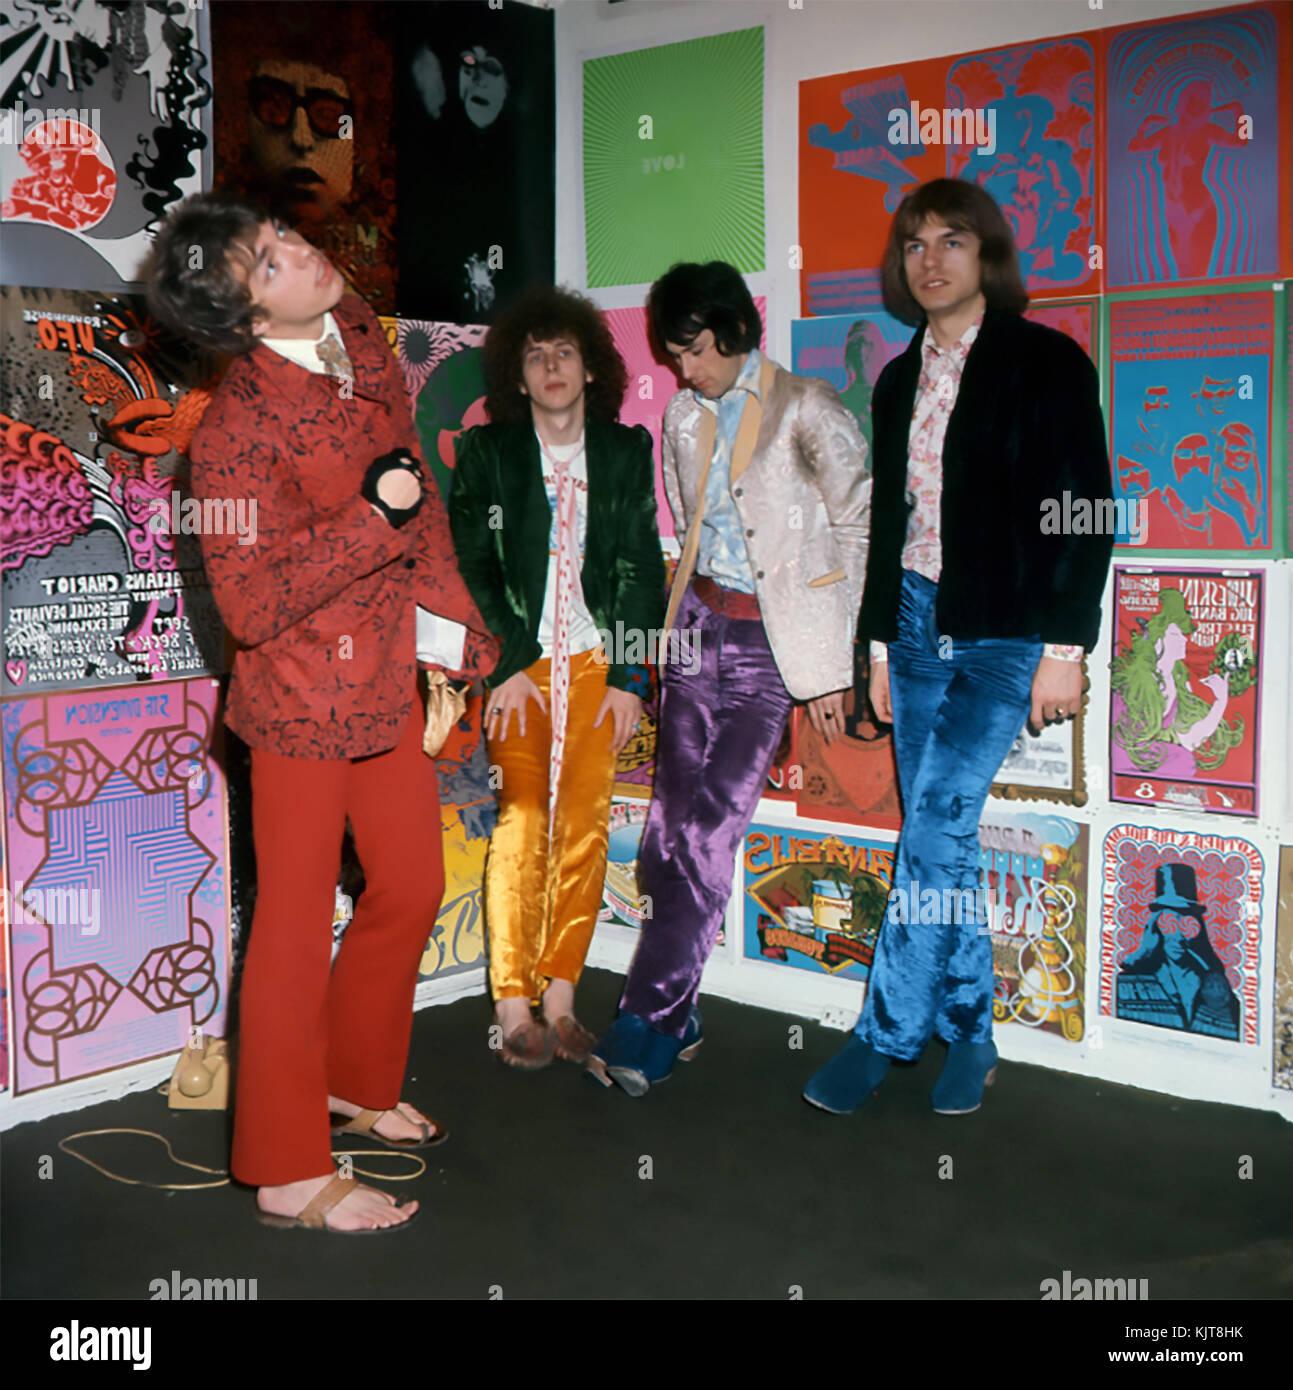 TOMORROW UK rock/pop group inJuly 1967. From left:  John Wood, John Alder, Keith West, Steve Howe. Photo: Tony Gale - Stock Image